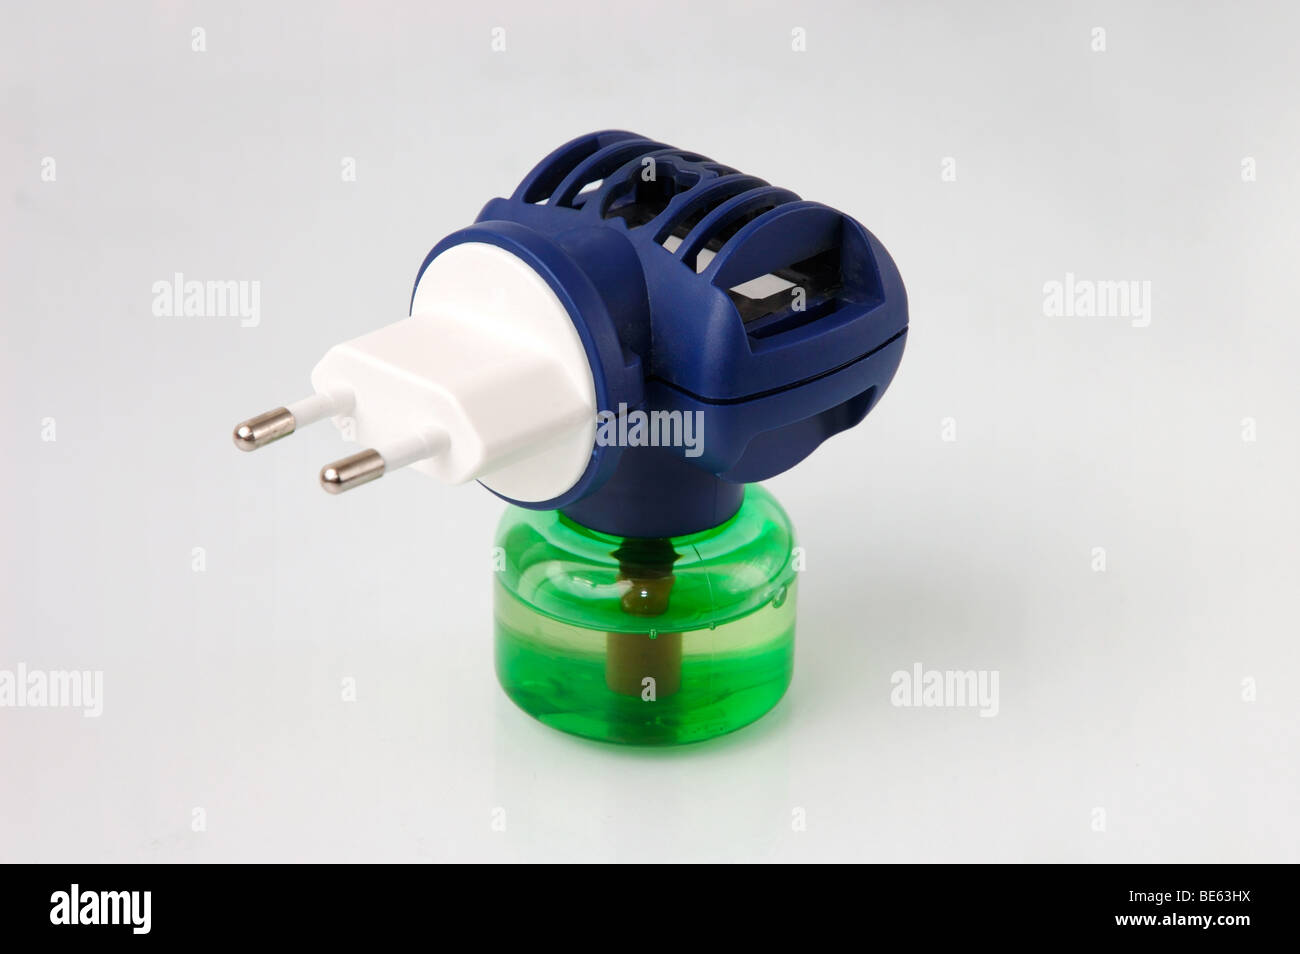 Electric Vaporizer Mosquito repellent Stock Photo